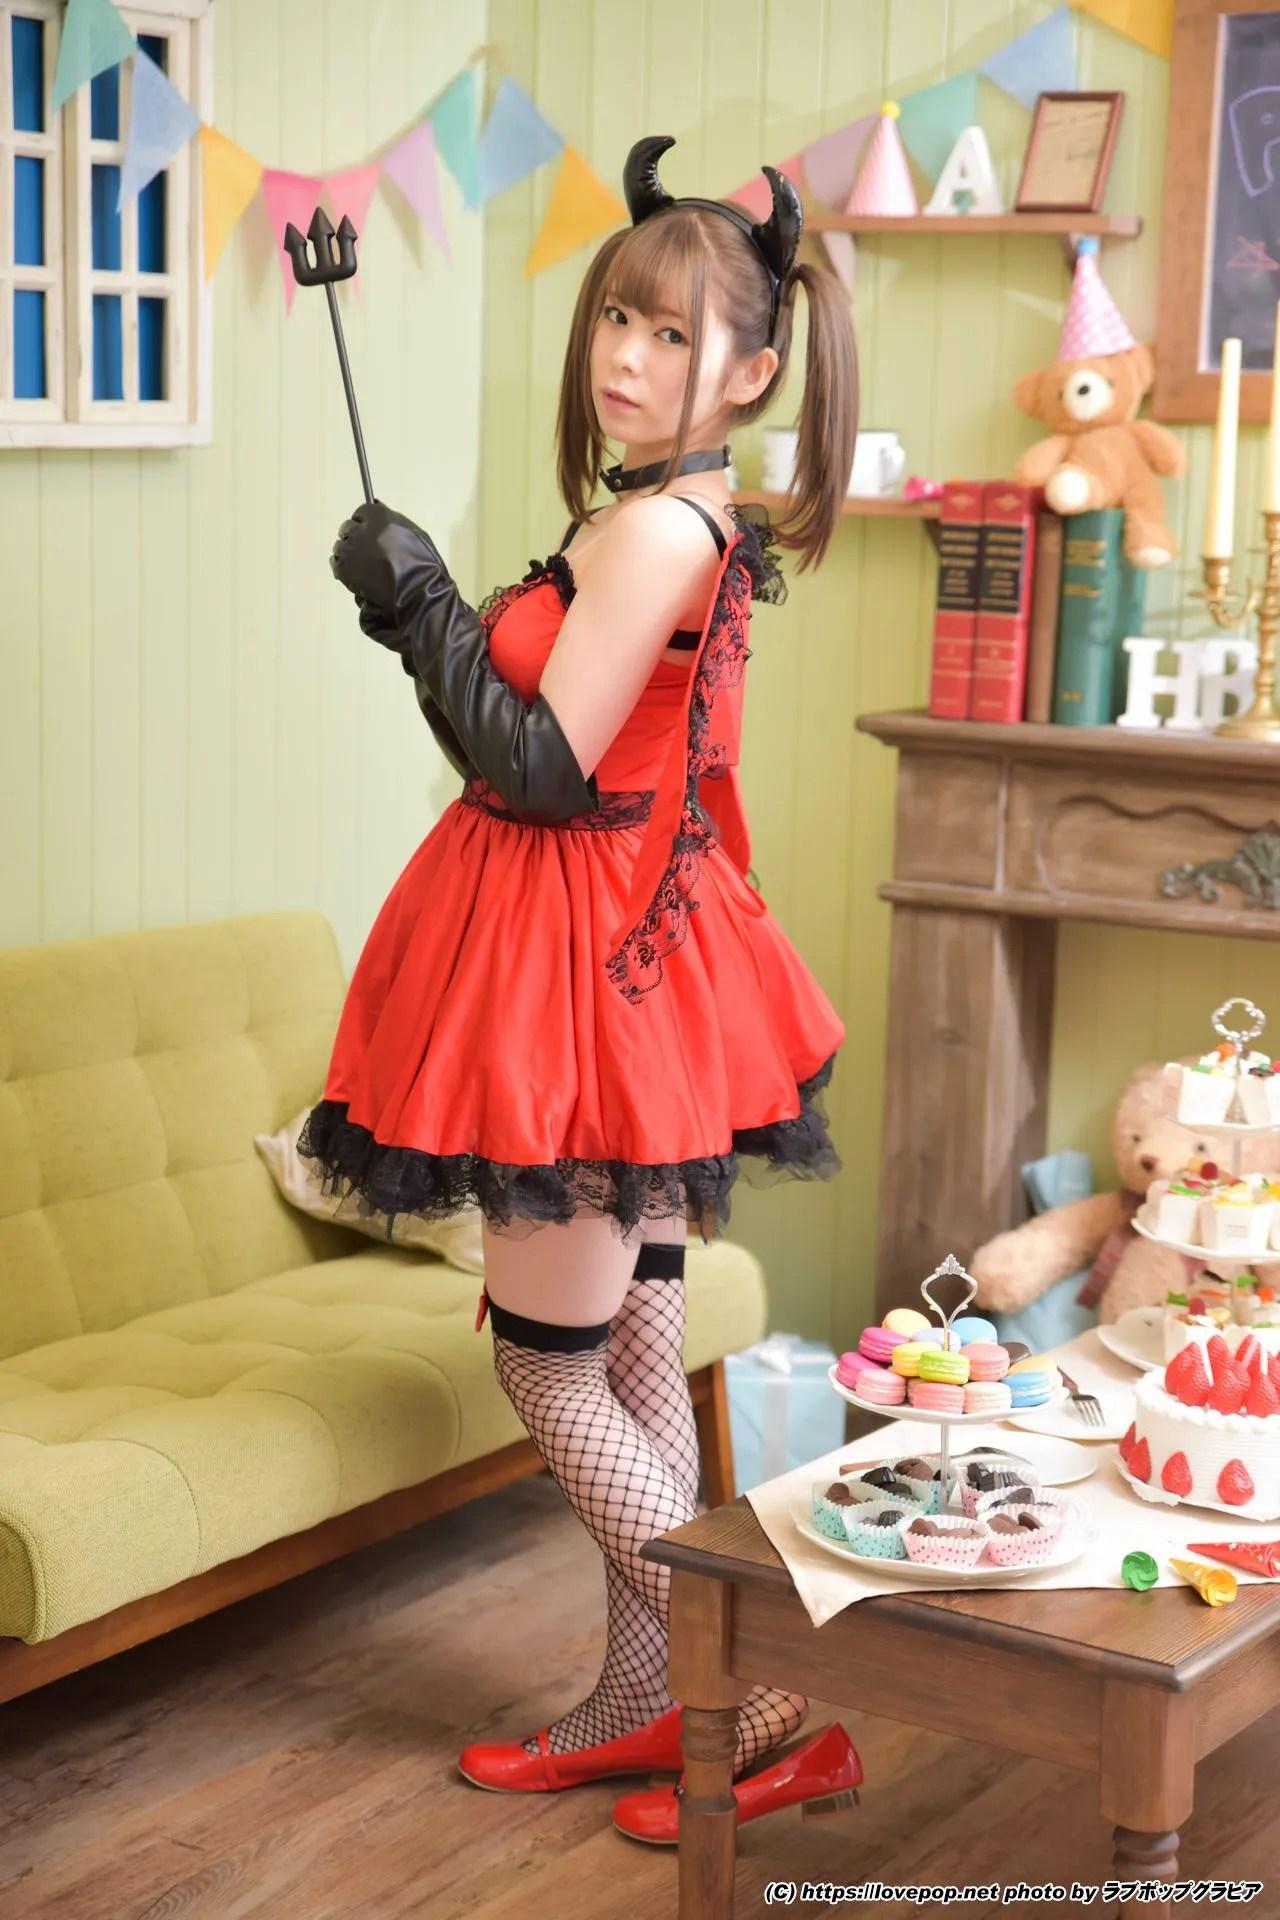 [LOVEPOP] Ren Aragaki 新垣恋 Photoset 01 写真集[55P]插图(5)